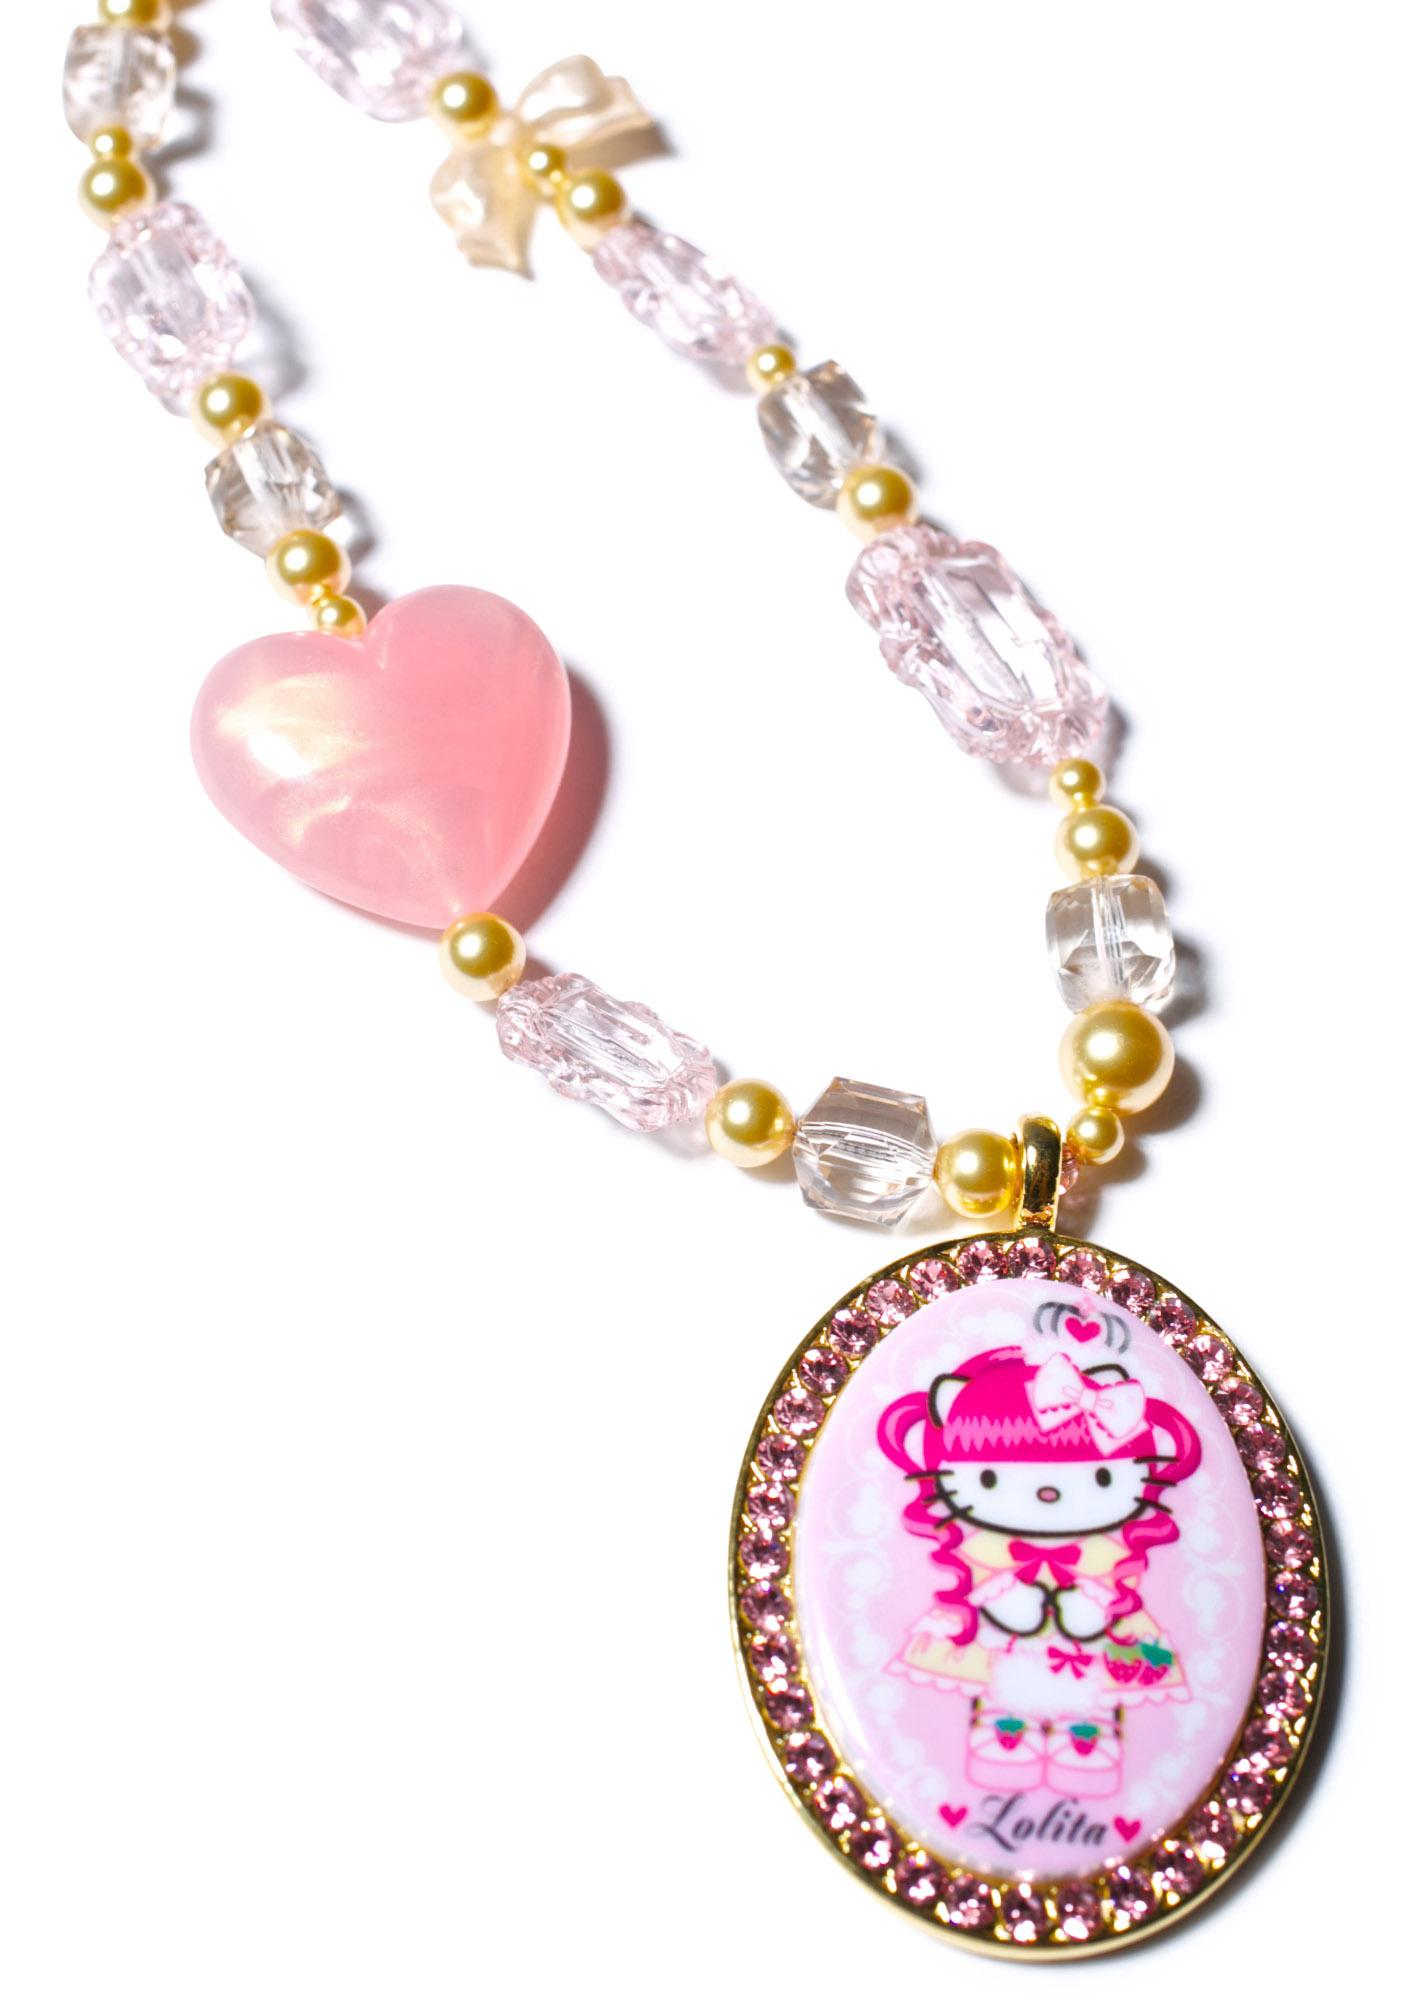 Tarina Tarantino Gothic Lolita Multibead Necklace